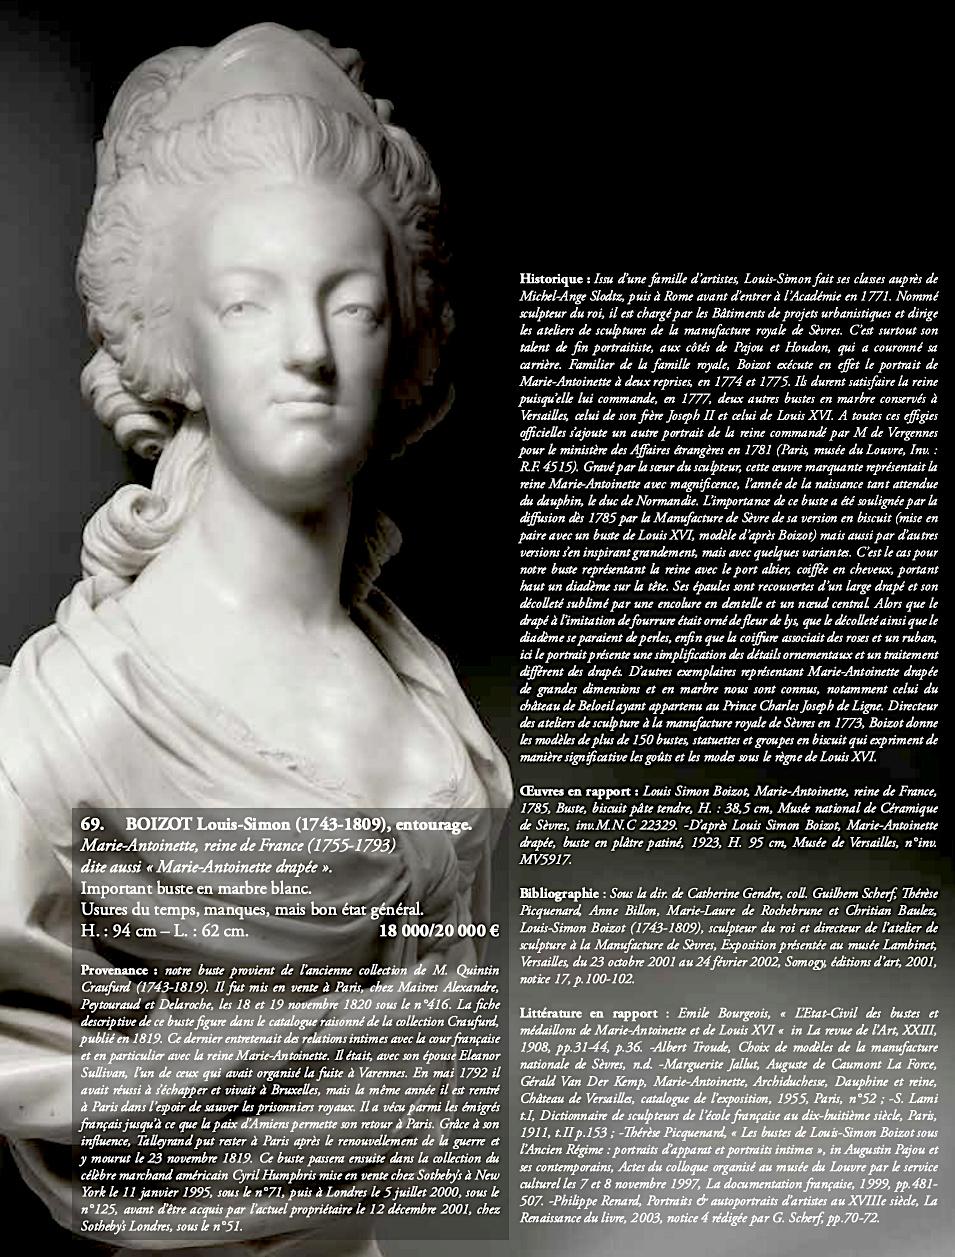 RIVAL - Quintin Craufurd (Quentin Crawford), un rival de Fersen - Page 8 Captu486